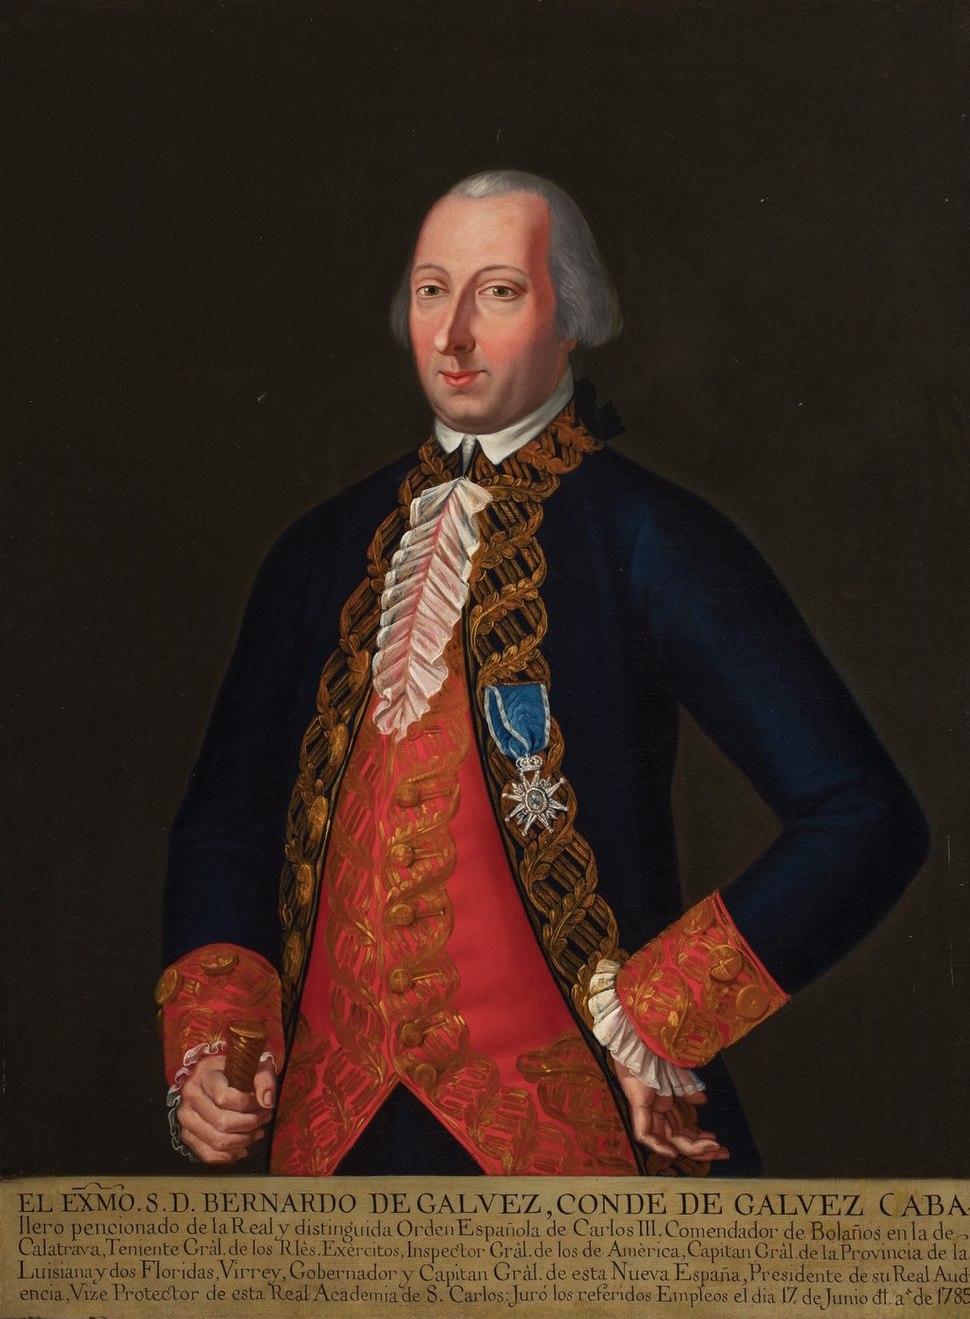 The Viscount of Galveston